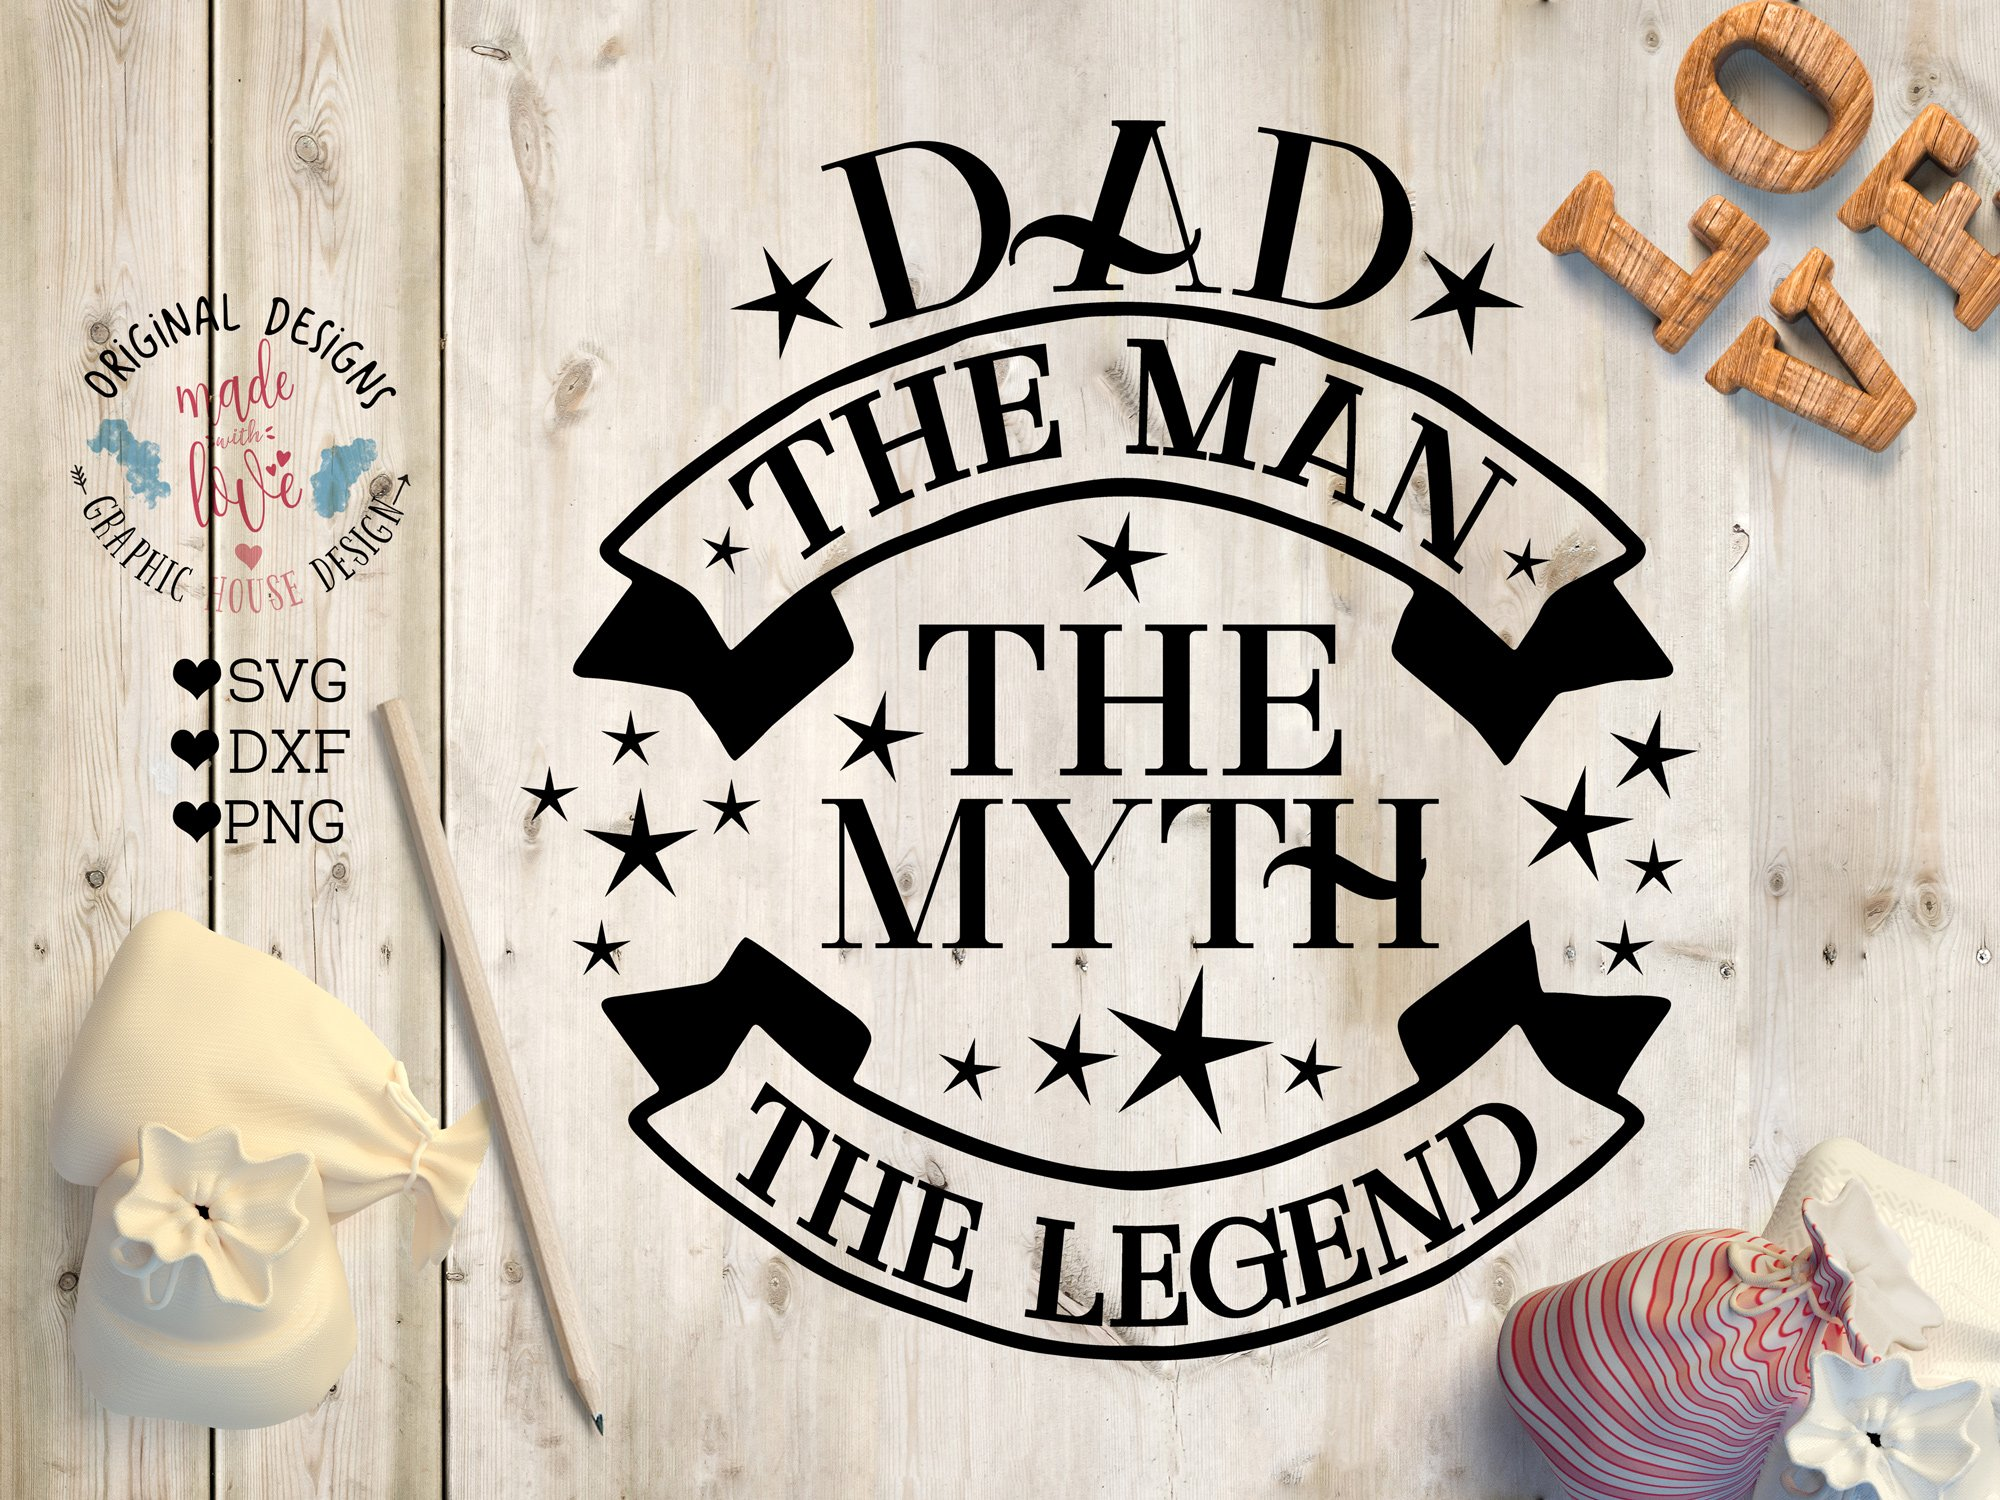 Dad the man the myth the legend illustrations creative market publicscrutiny Gallery